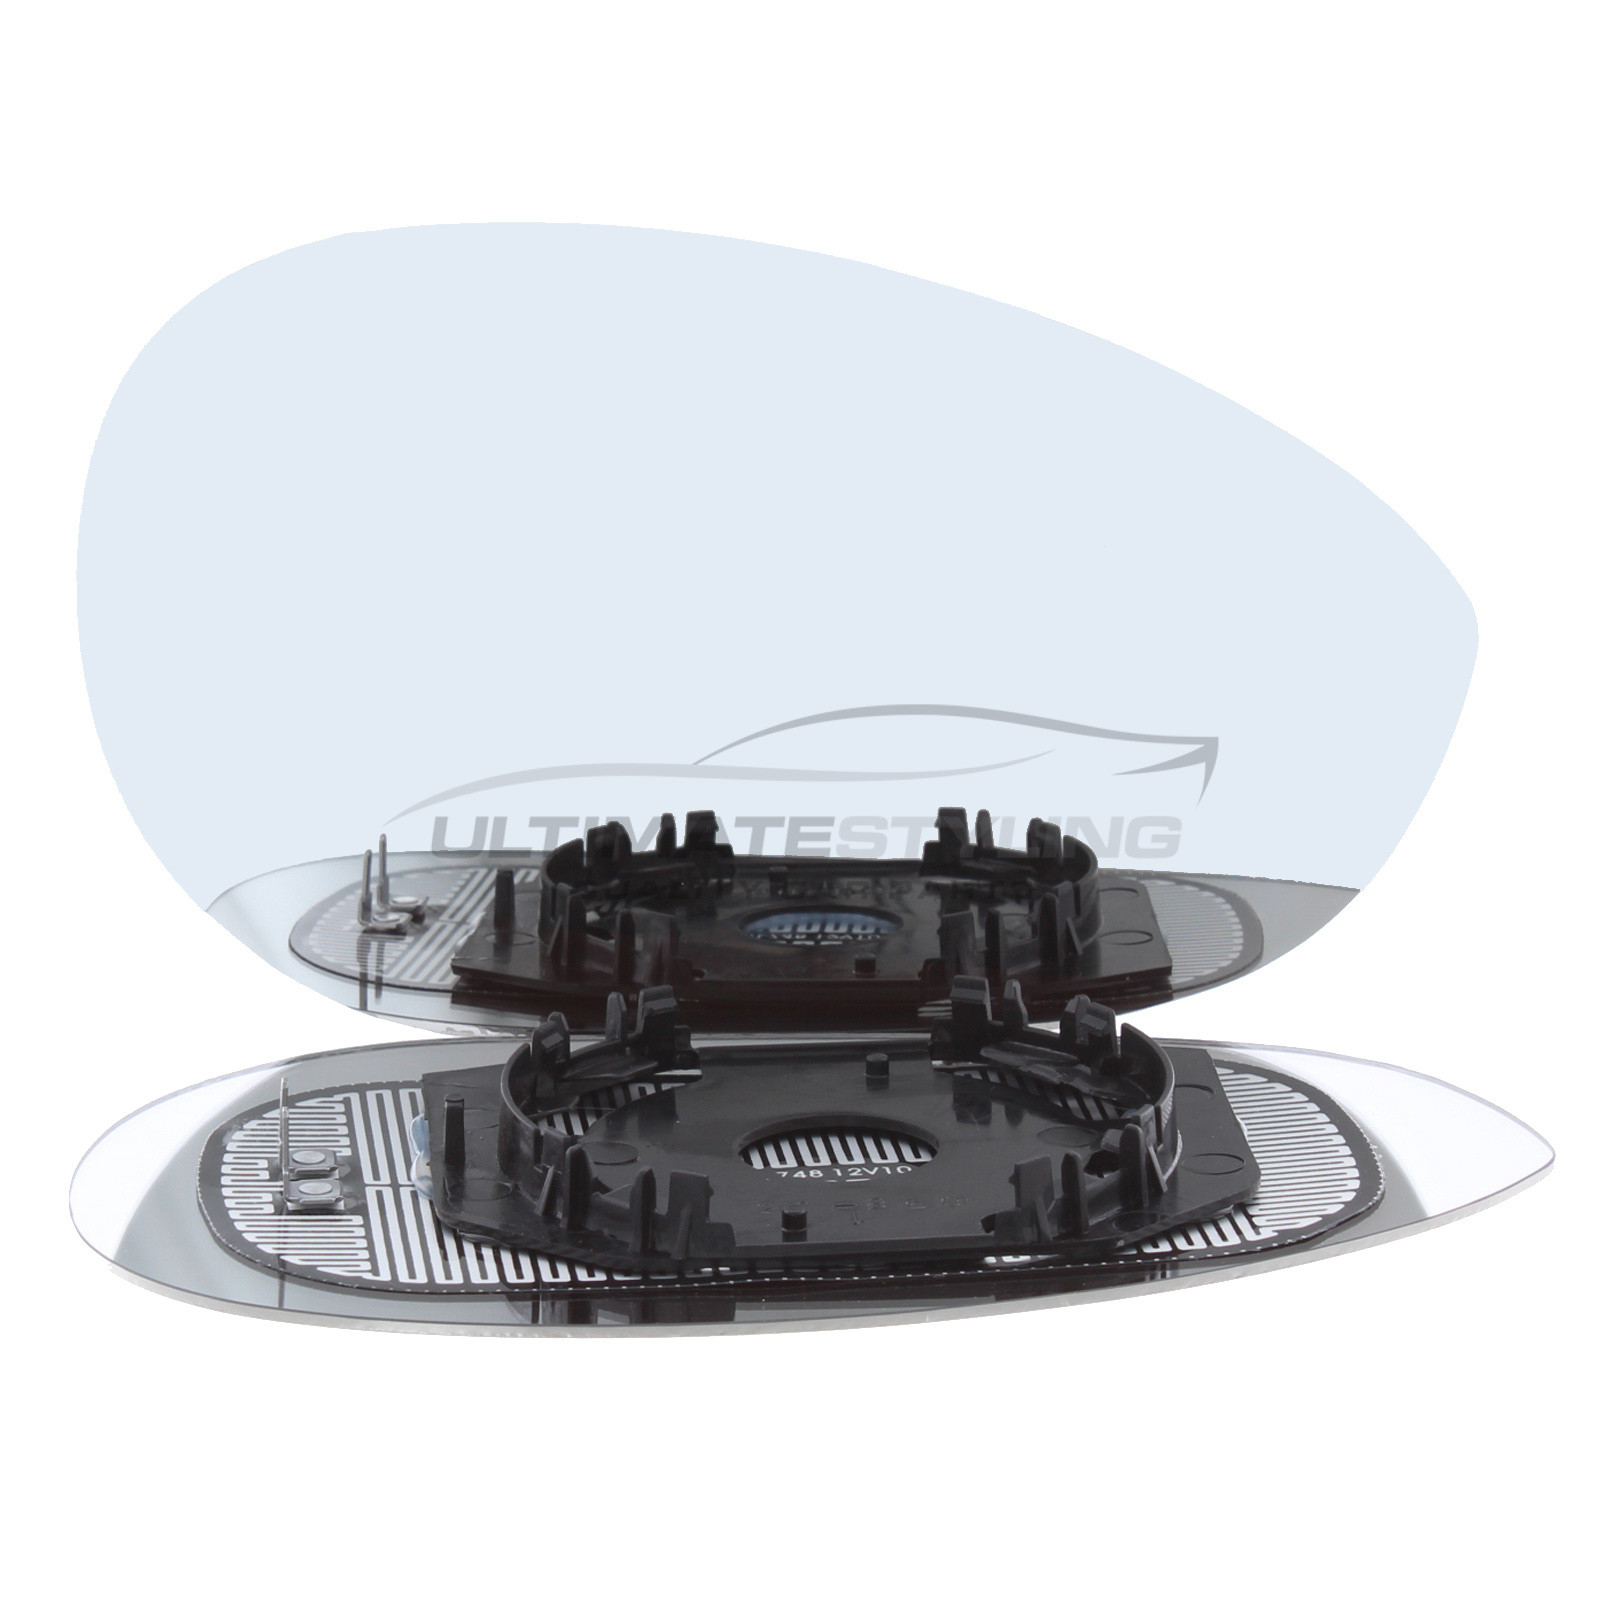 Fiat 500 2008> / Punto 2012-2018 / Grande Punto 2006-2010 / Punto Evo 2010-2012 / Abarth 500 / 595 & 695 2015> Wing Mirror Glass - Drivers Side (RH) - Heated - Convex - Chrome